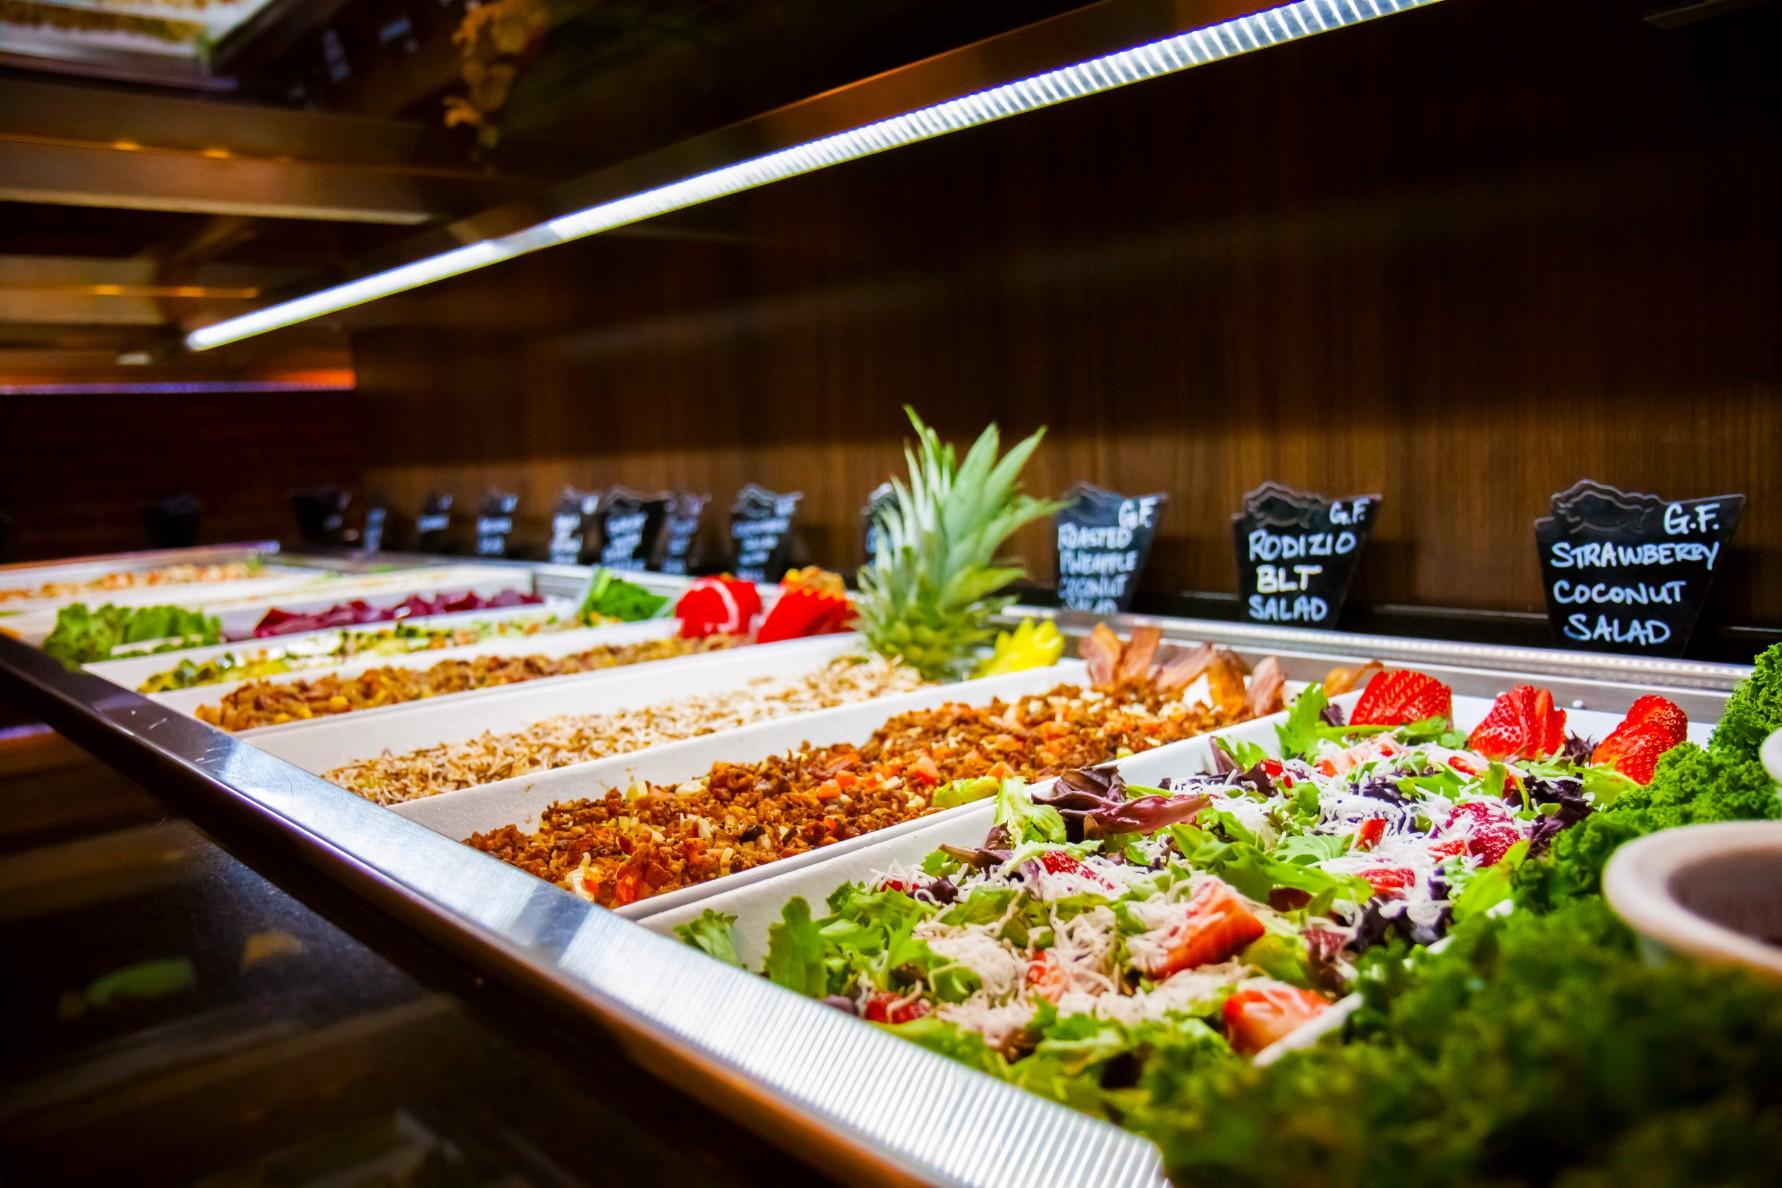 rodizio grill nashville brazilian steakhouse in nashville rh rodiziogrill com buffets in nashville tennessee chinese buffets in nashville